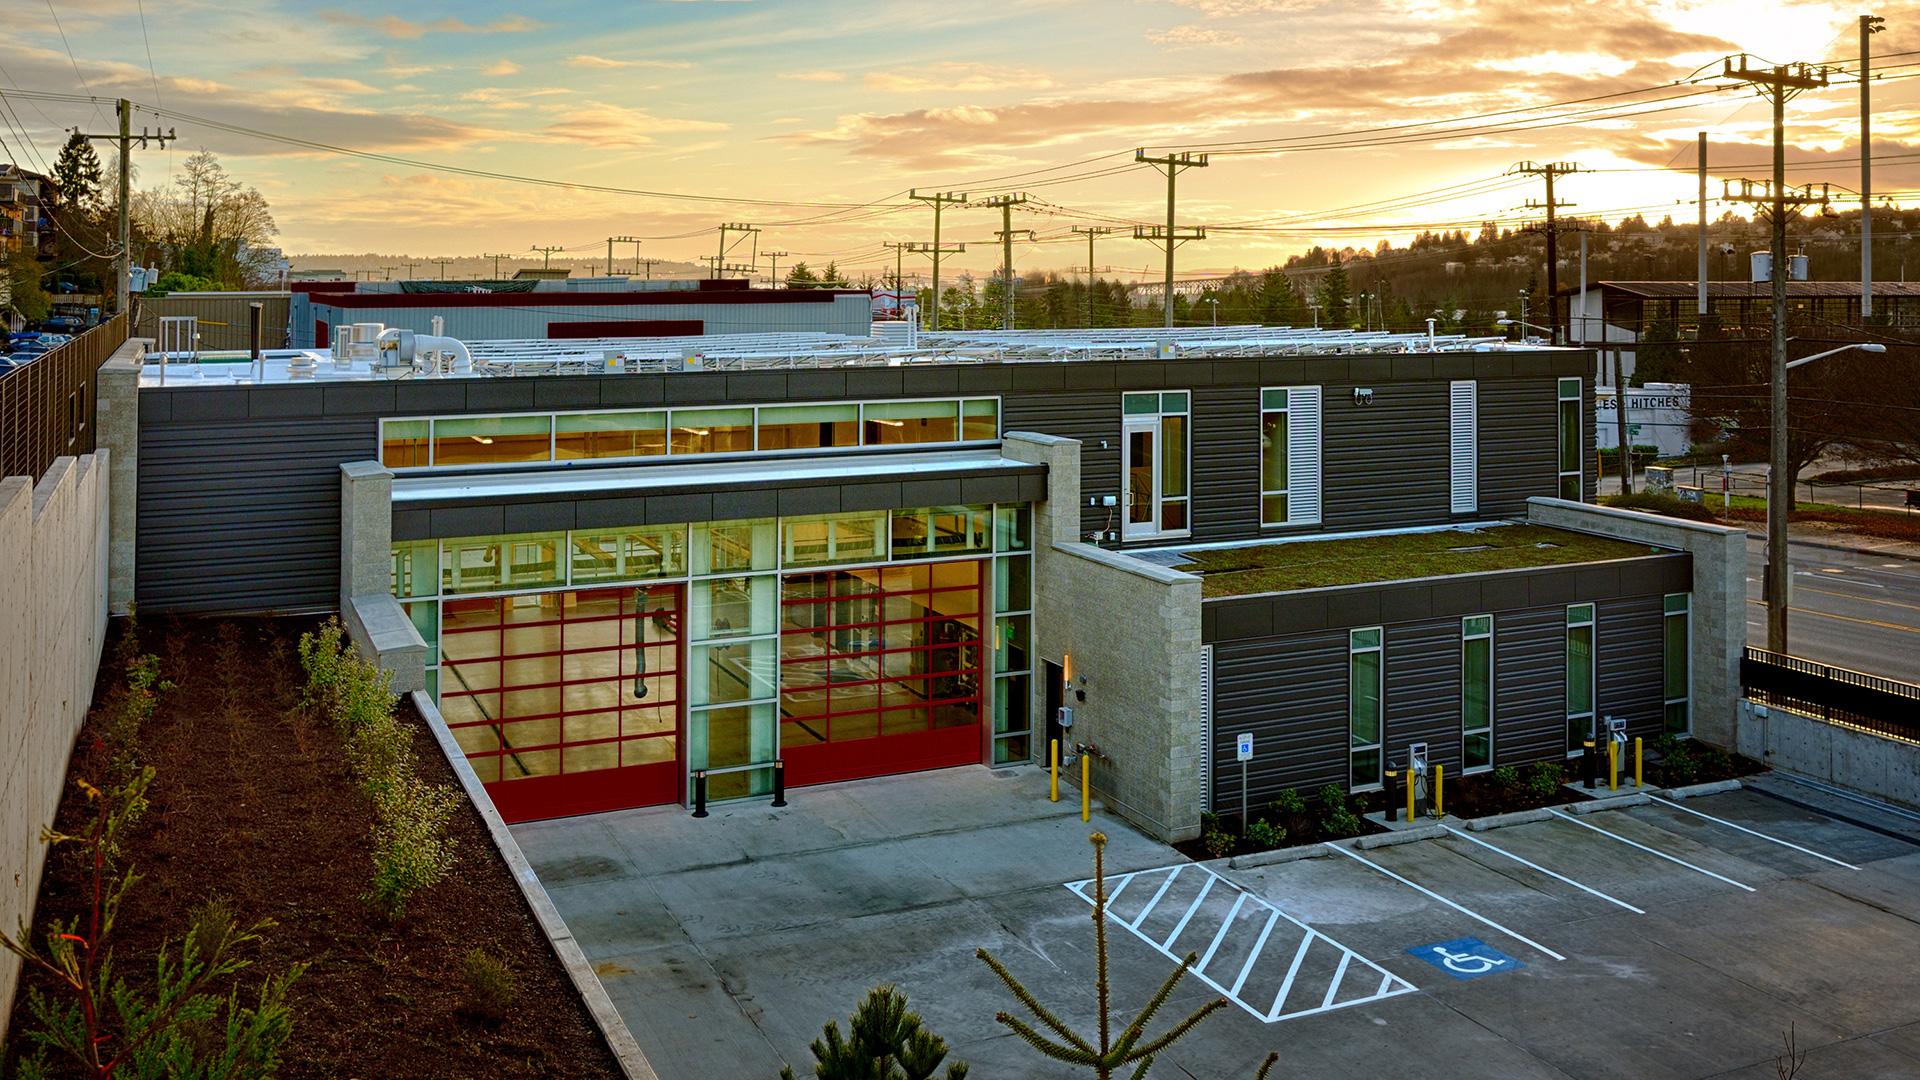 interbay fire station 20